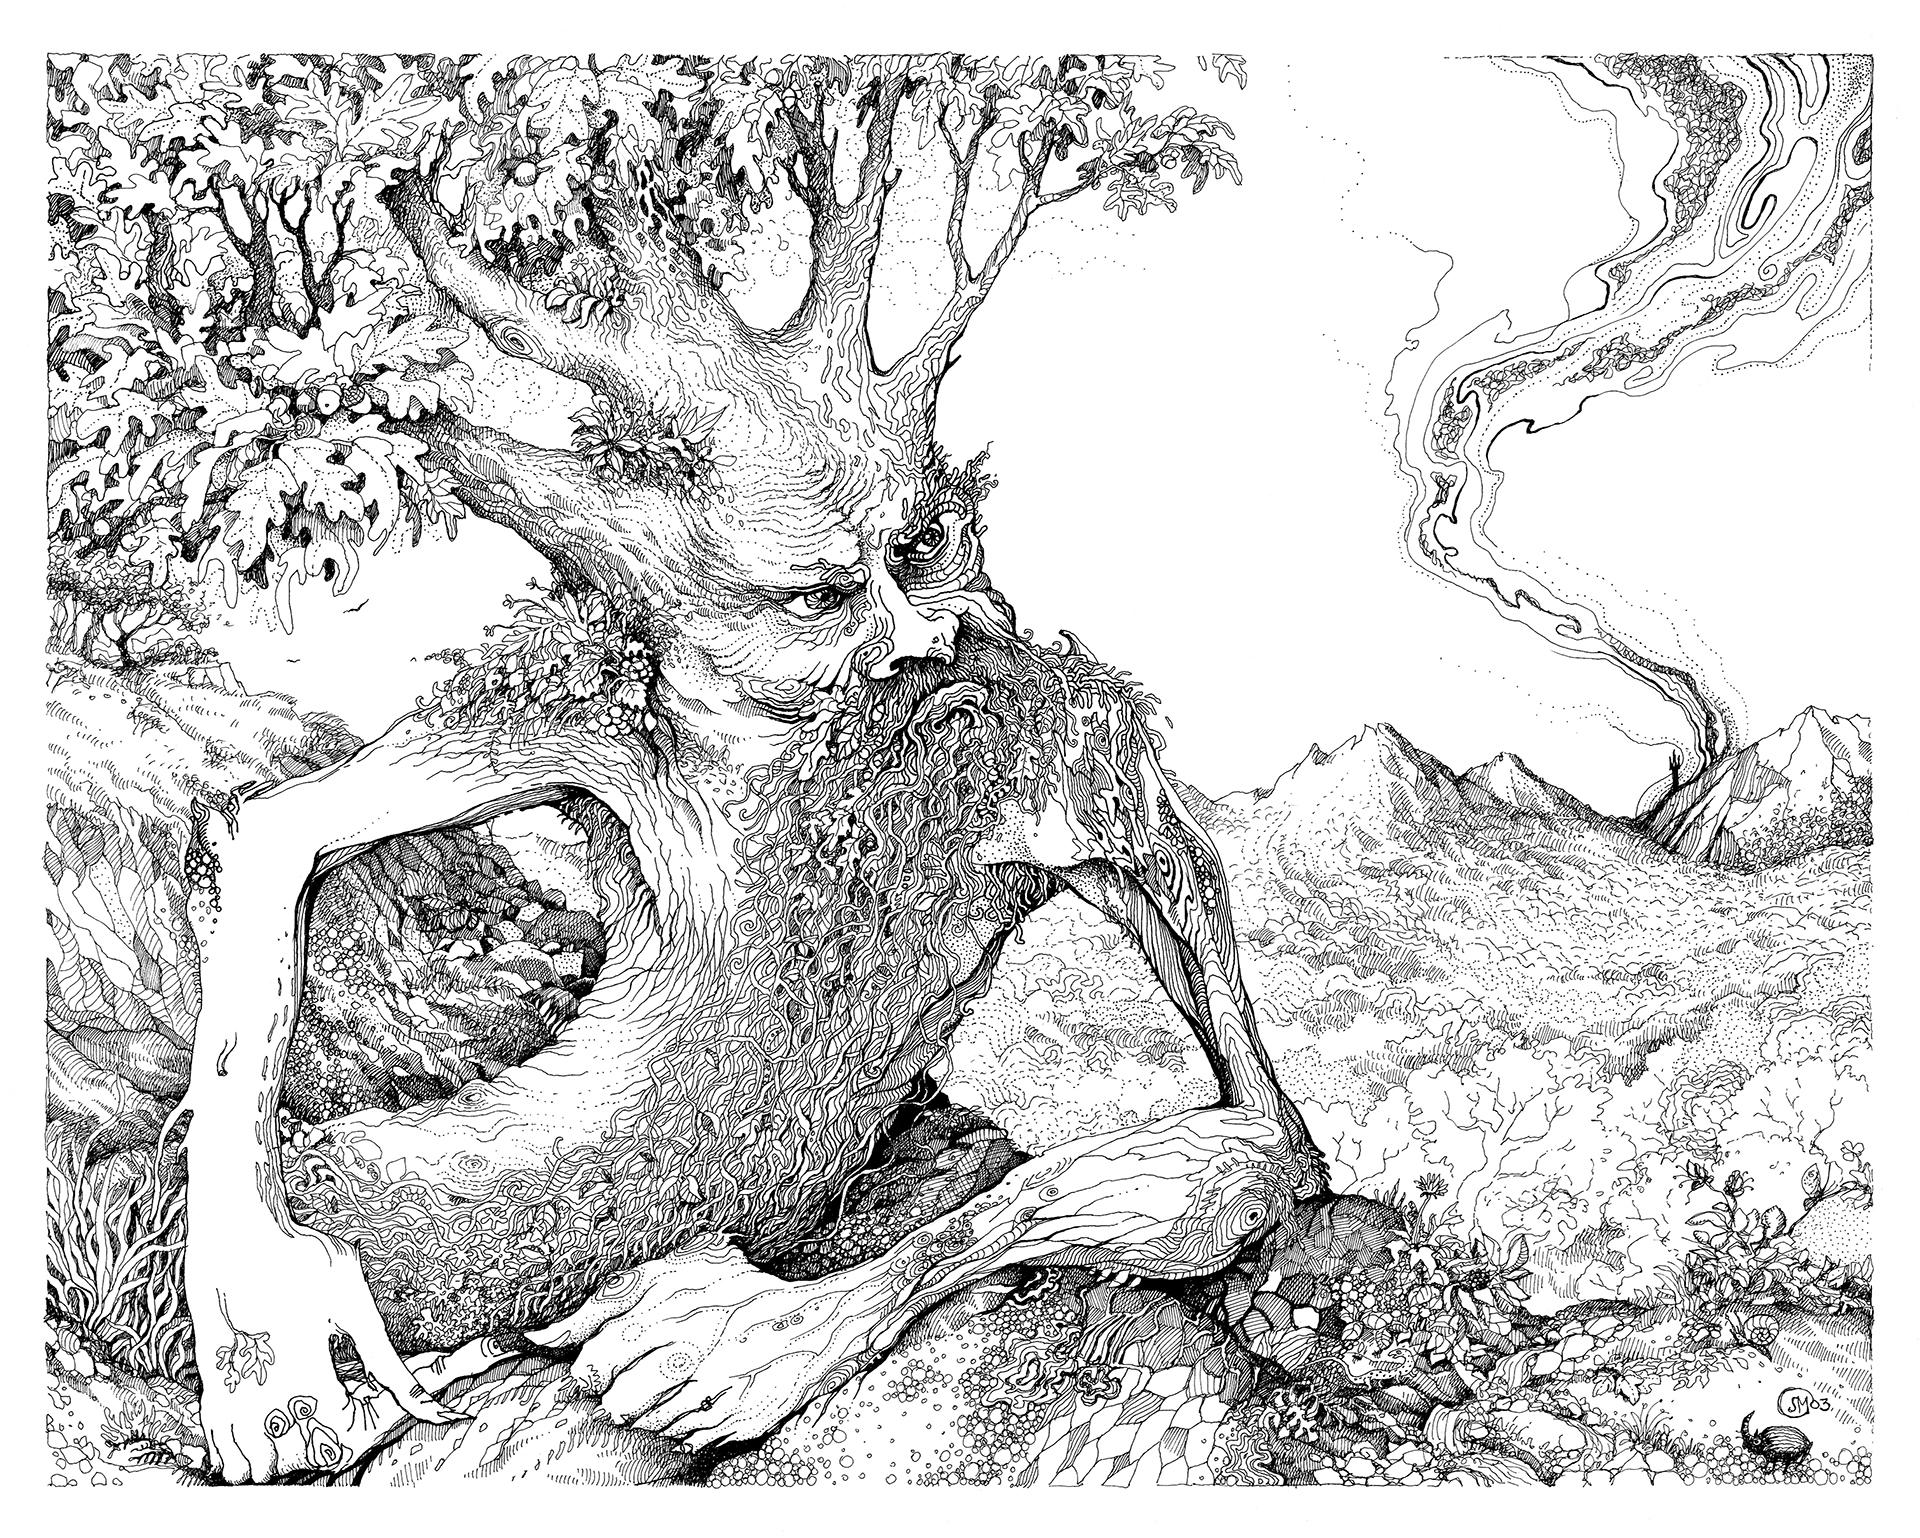 Treebeard lyubabogan p i lep bvue88